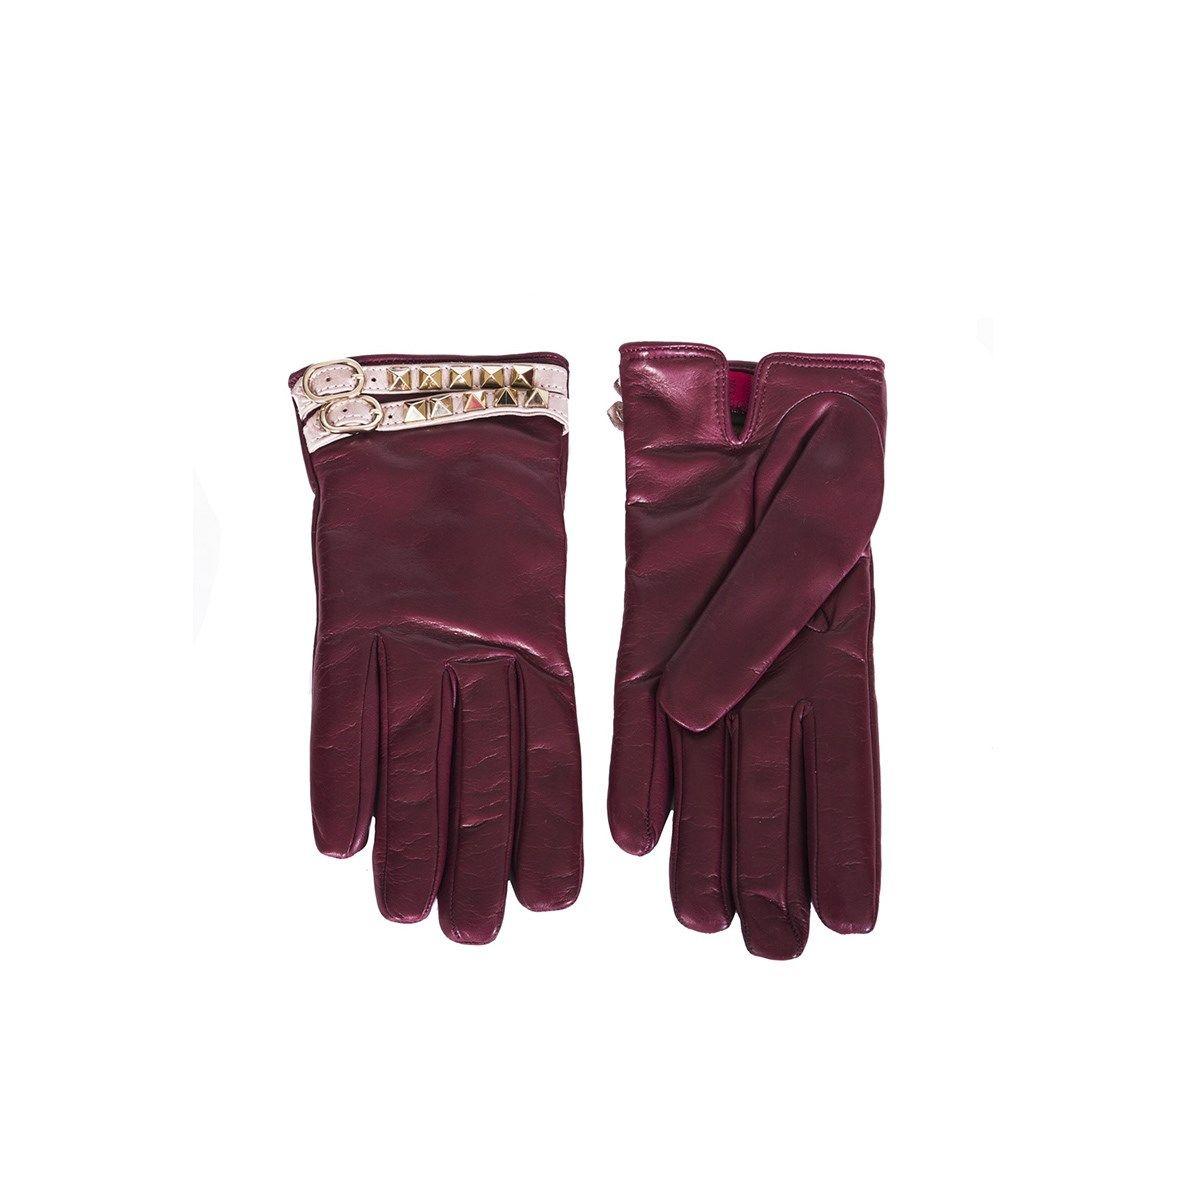 Burgundy Rockstud Gloves